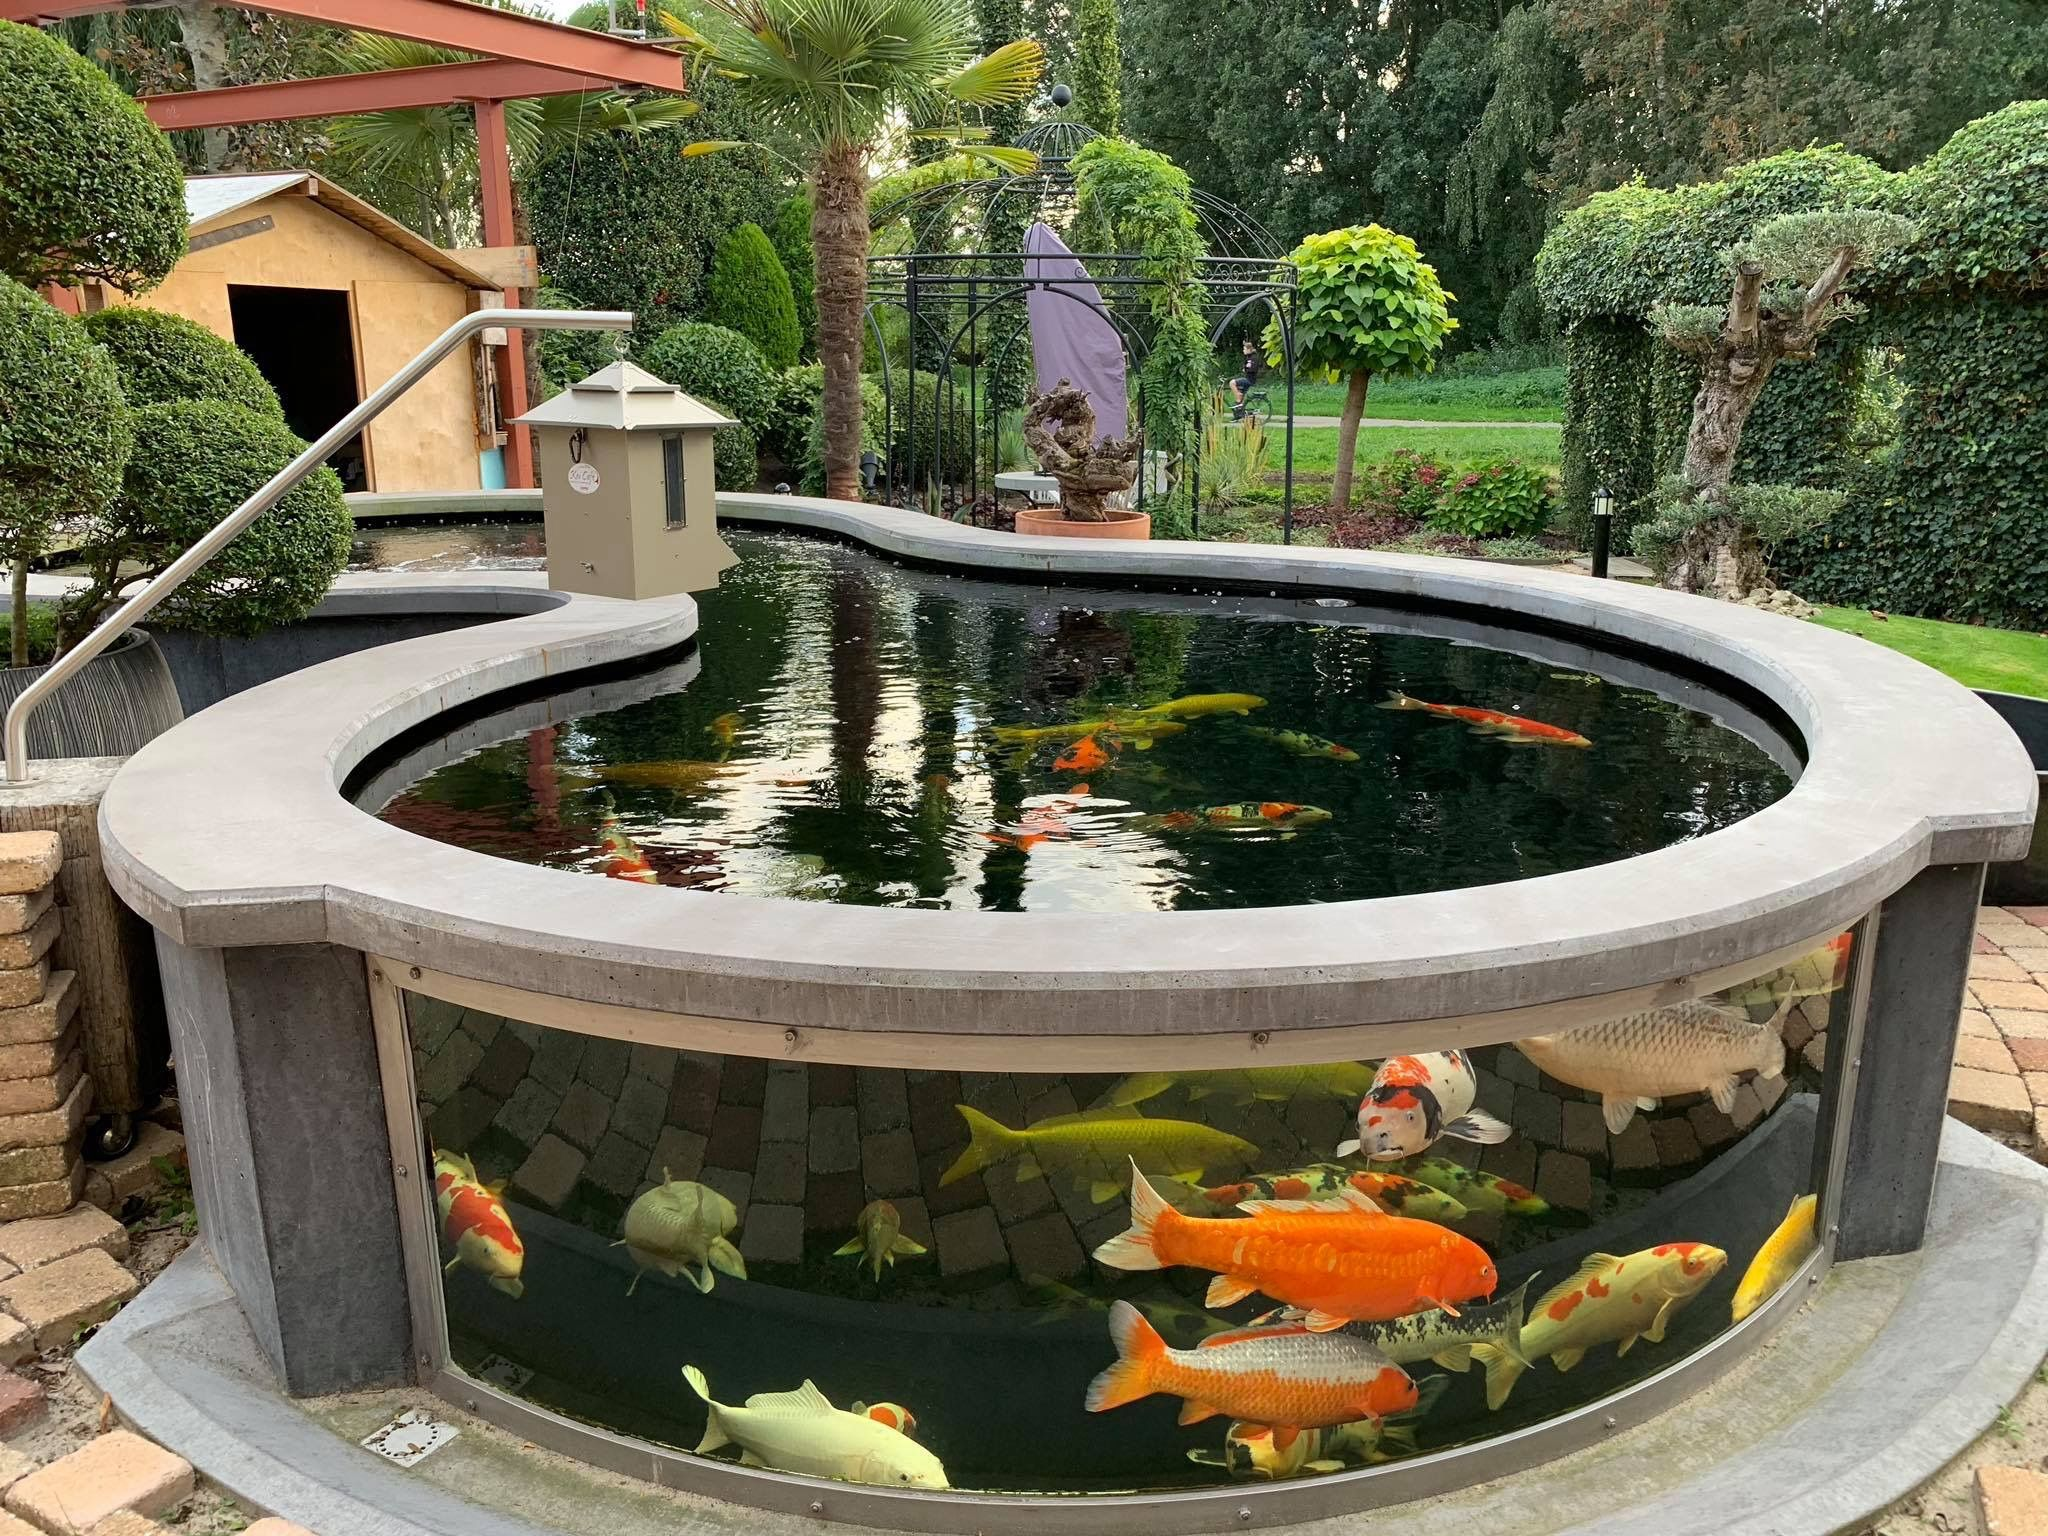 koi fish image by Judy Martinez Fish pond gardens, Ponds